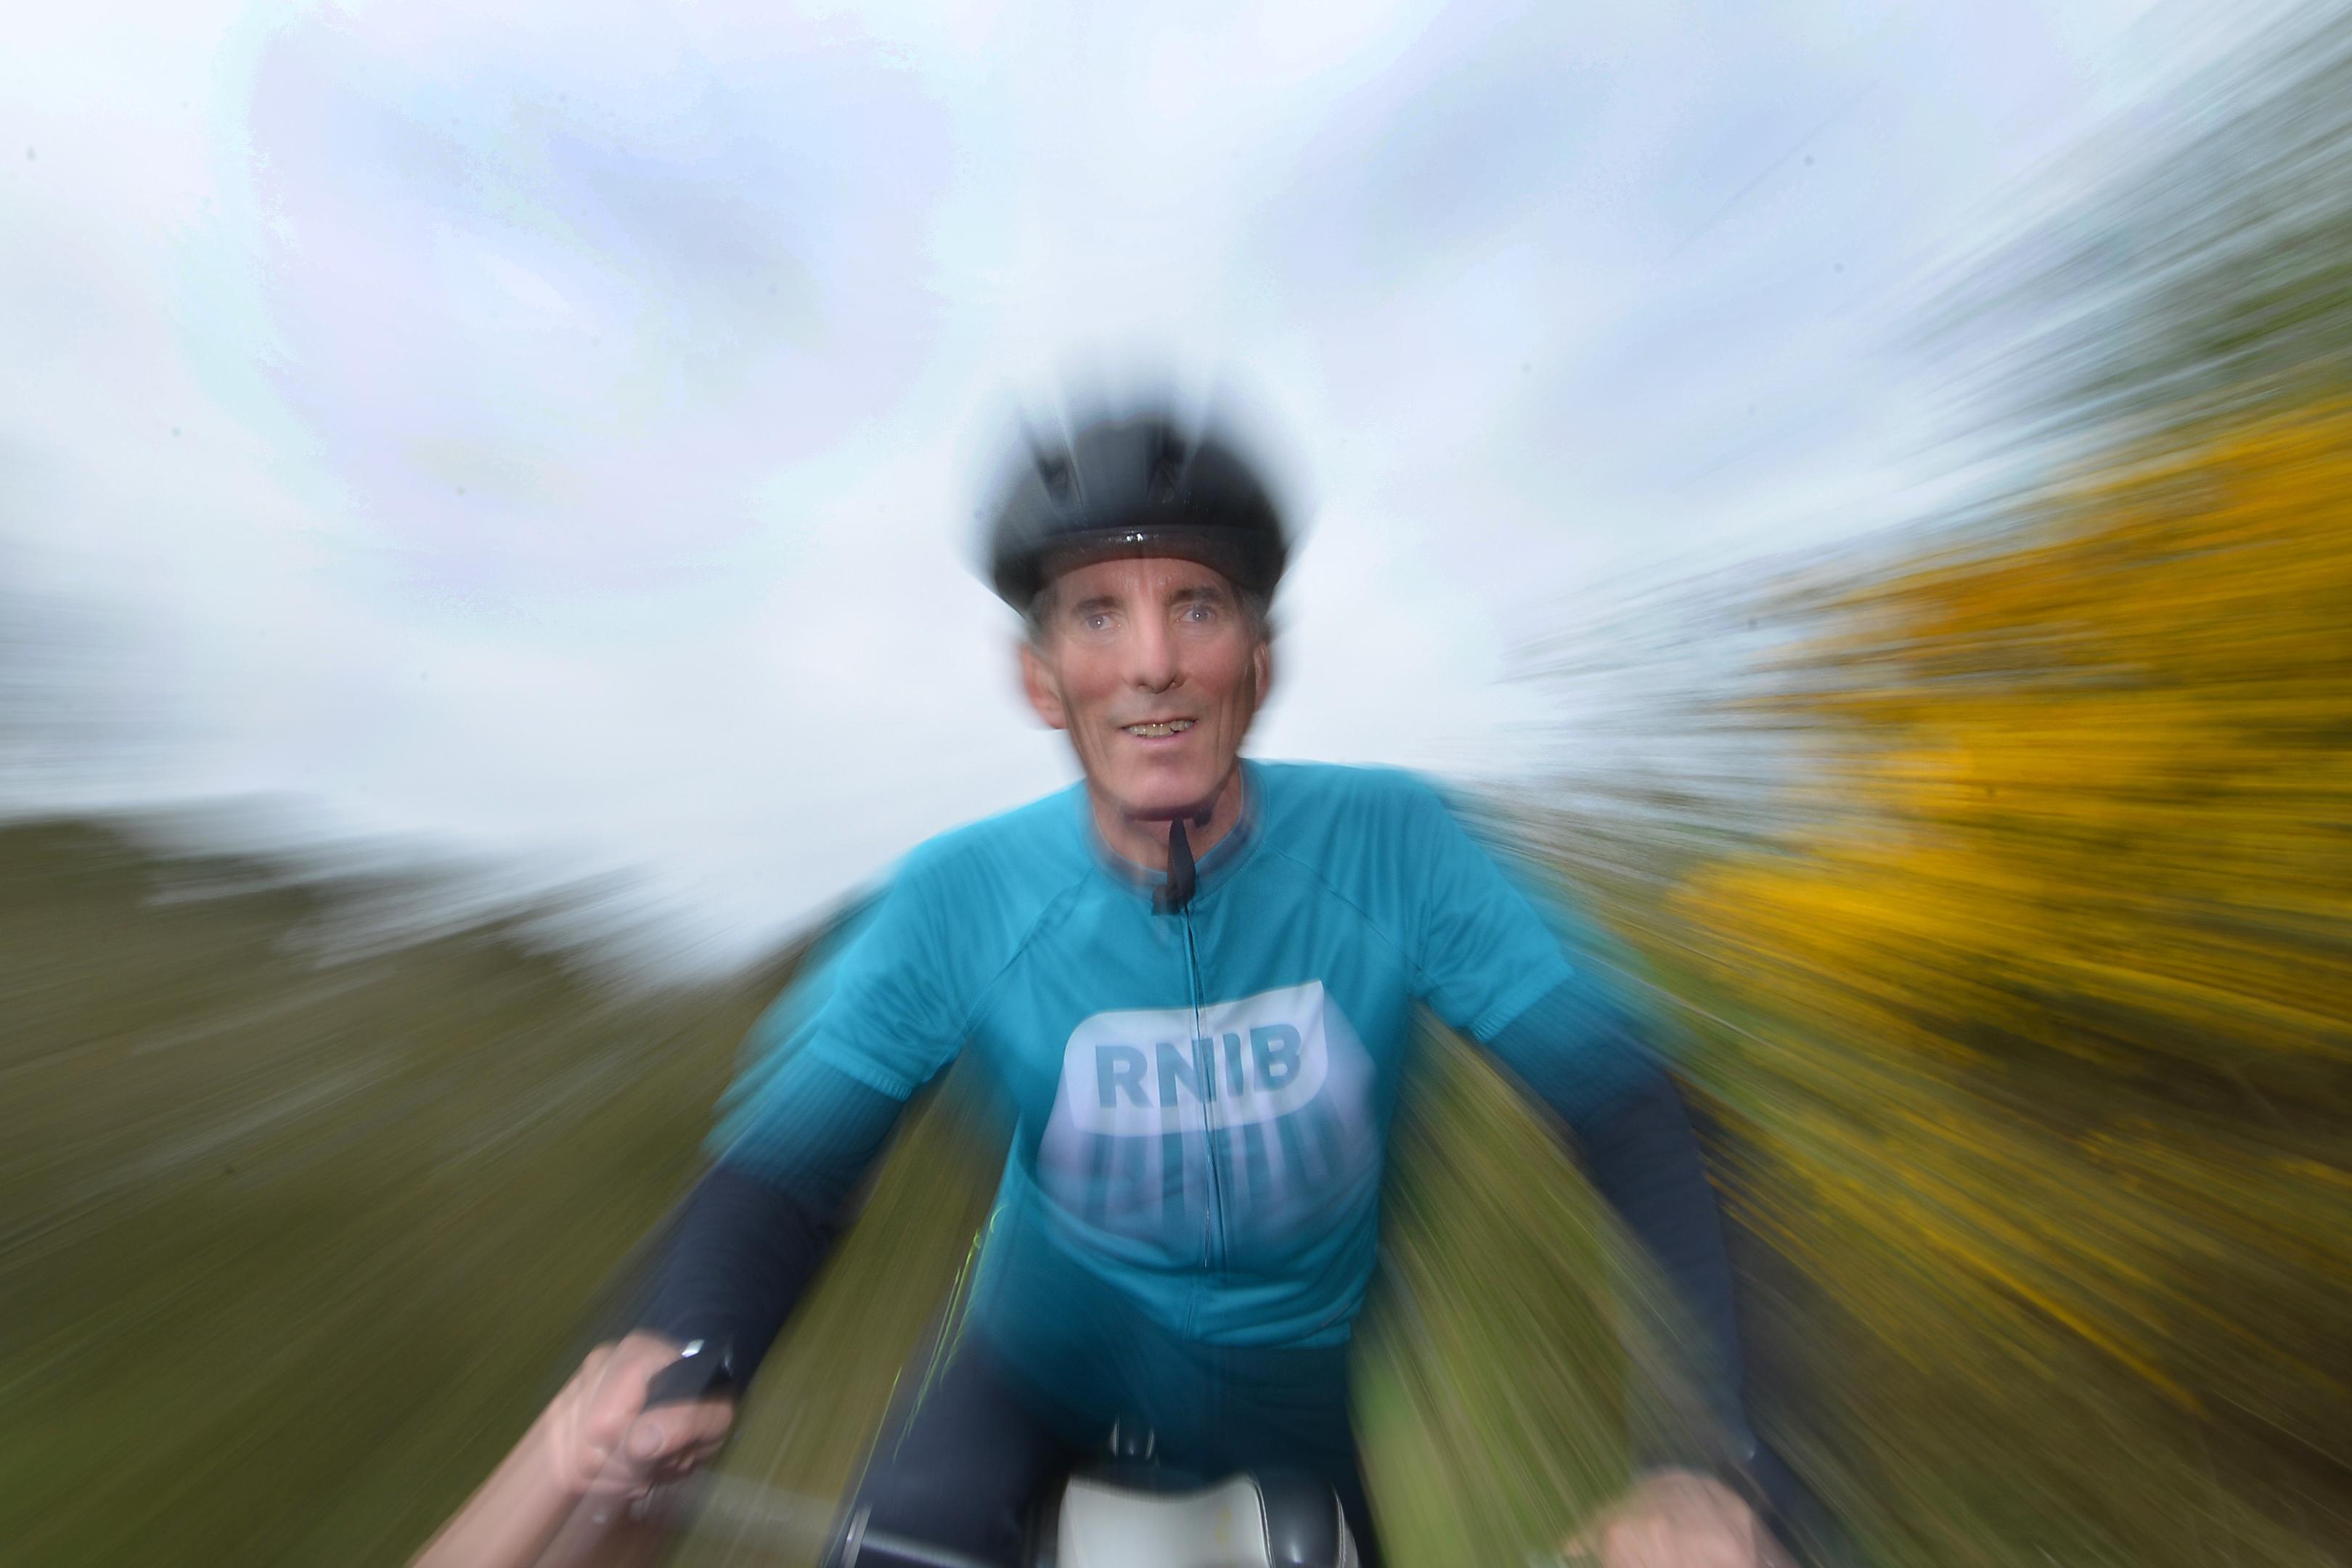 Ken on his bike. Photo courtesy of Jon Savage Photography.